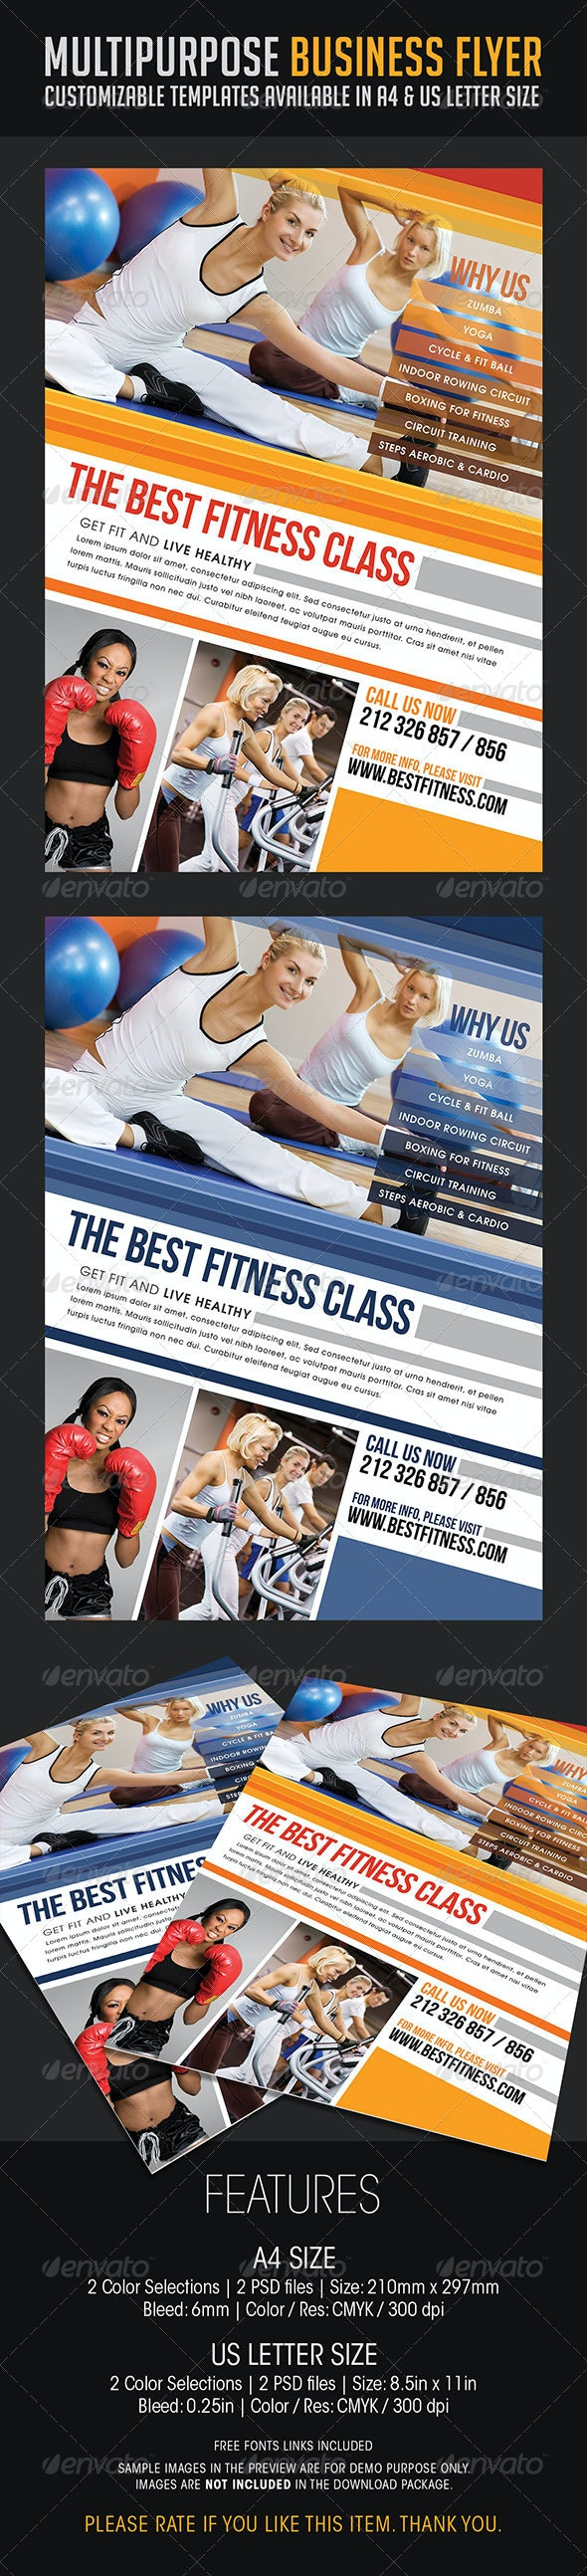 Multipurpose Business Flyer 04 - Flyers Print Templates